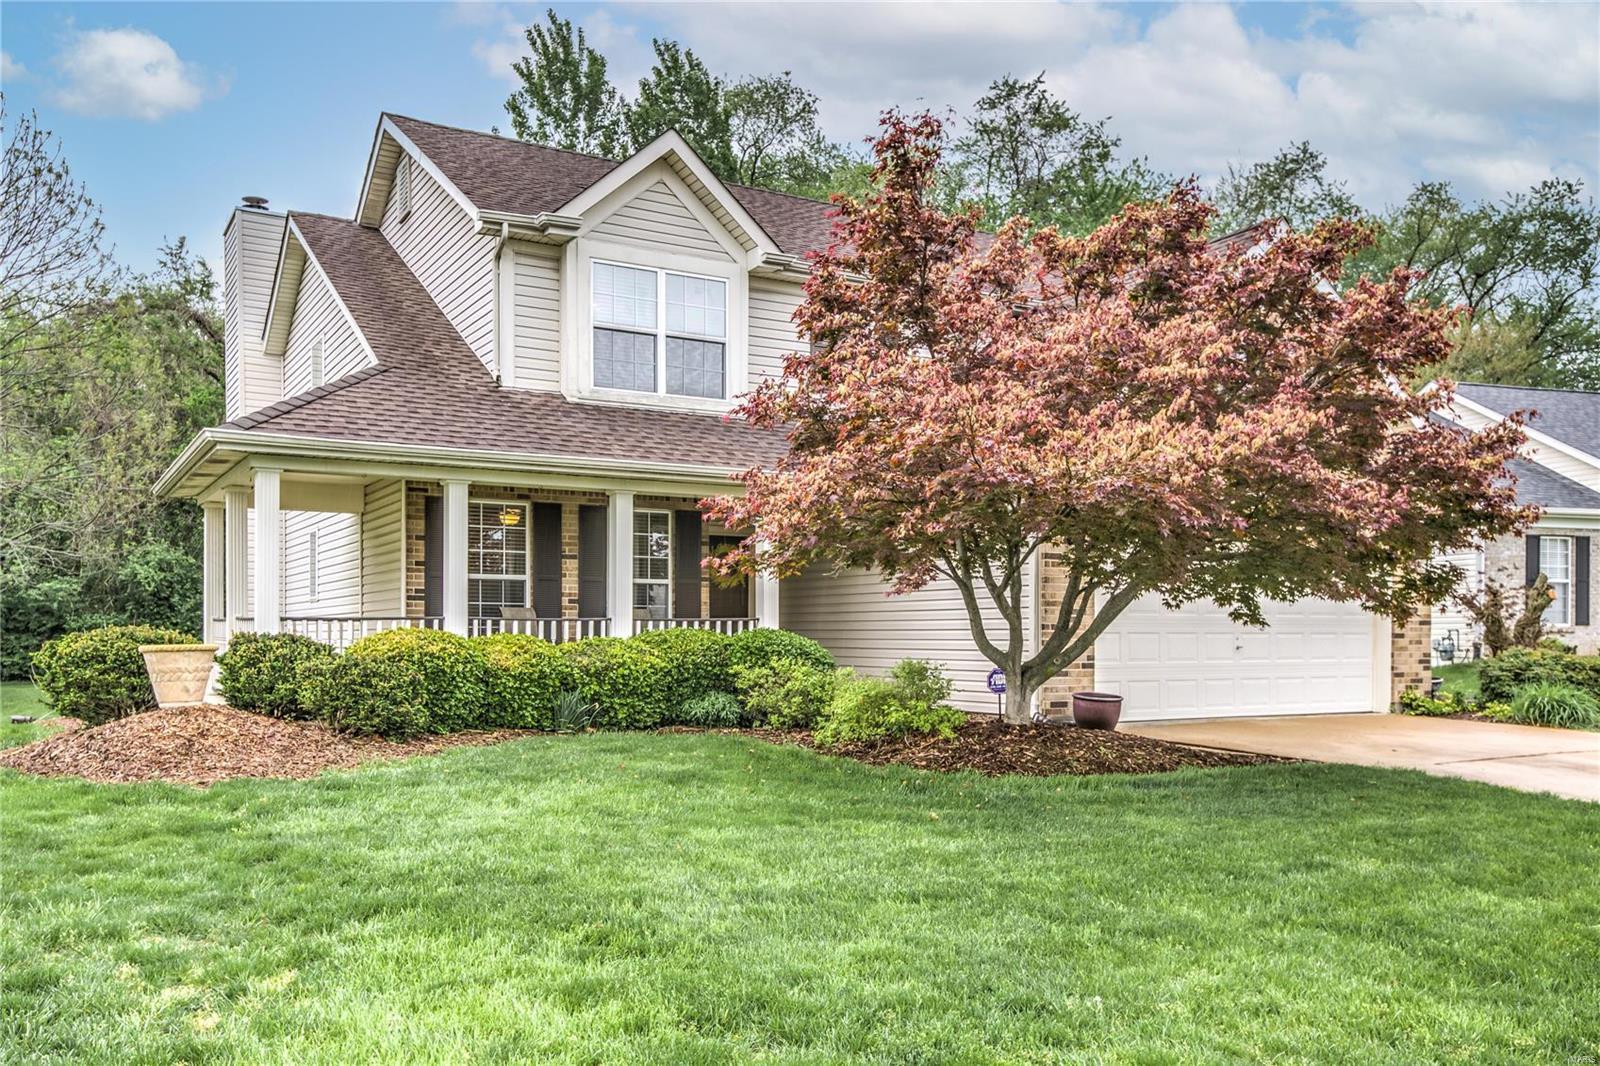 3849 Depaul Meadows Court Property Photo - Bridgeton, MO real estate listing